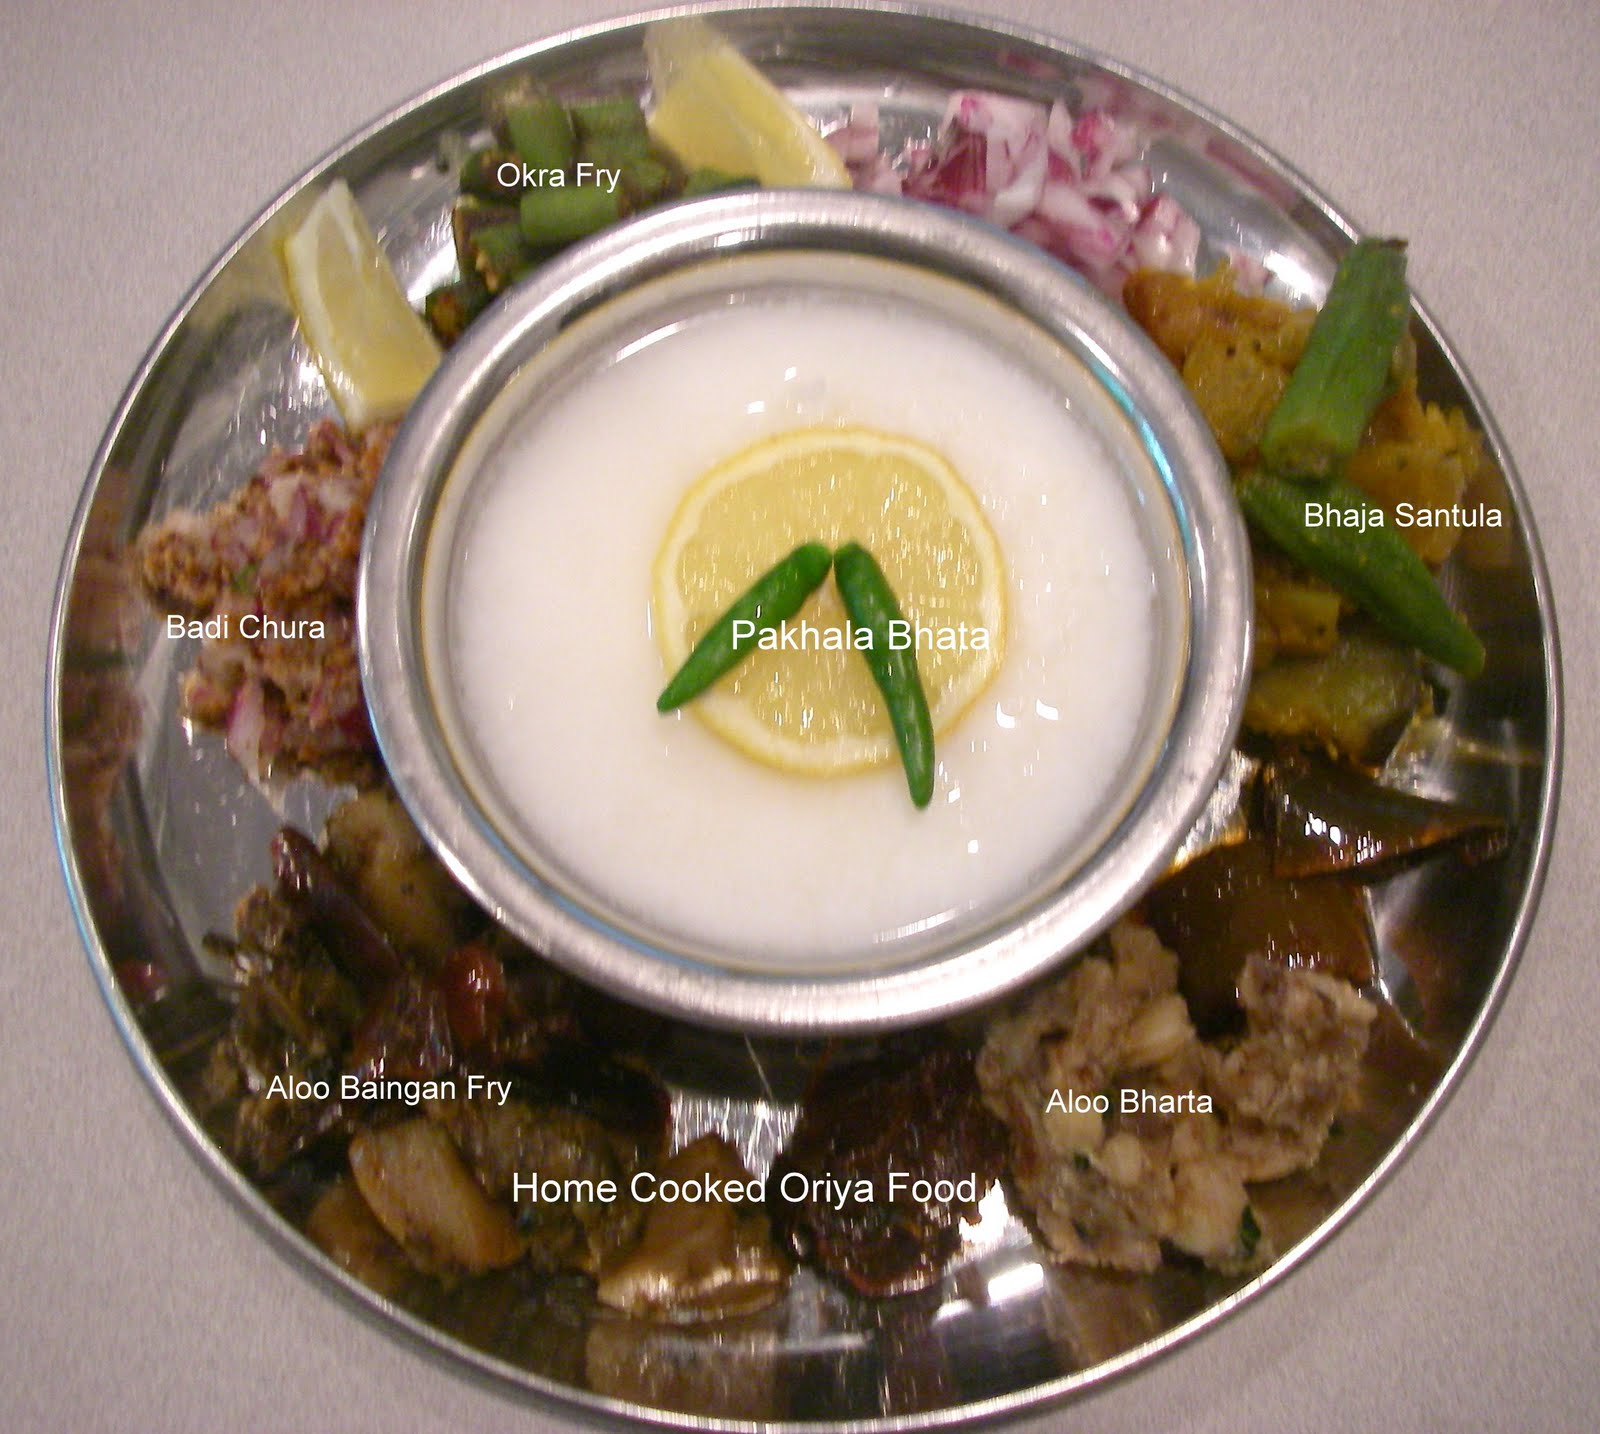 Oriya food summer feast with pakhala bhata summer feast with pakhala bhata forumfinder Choice Image